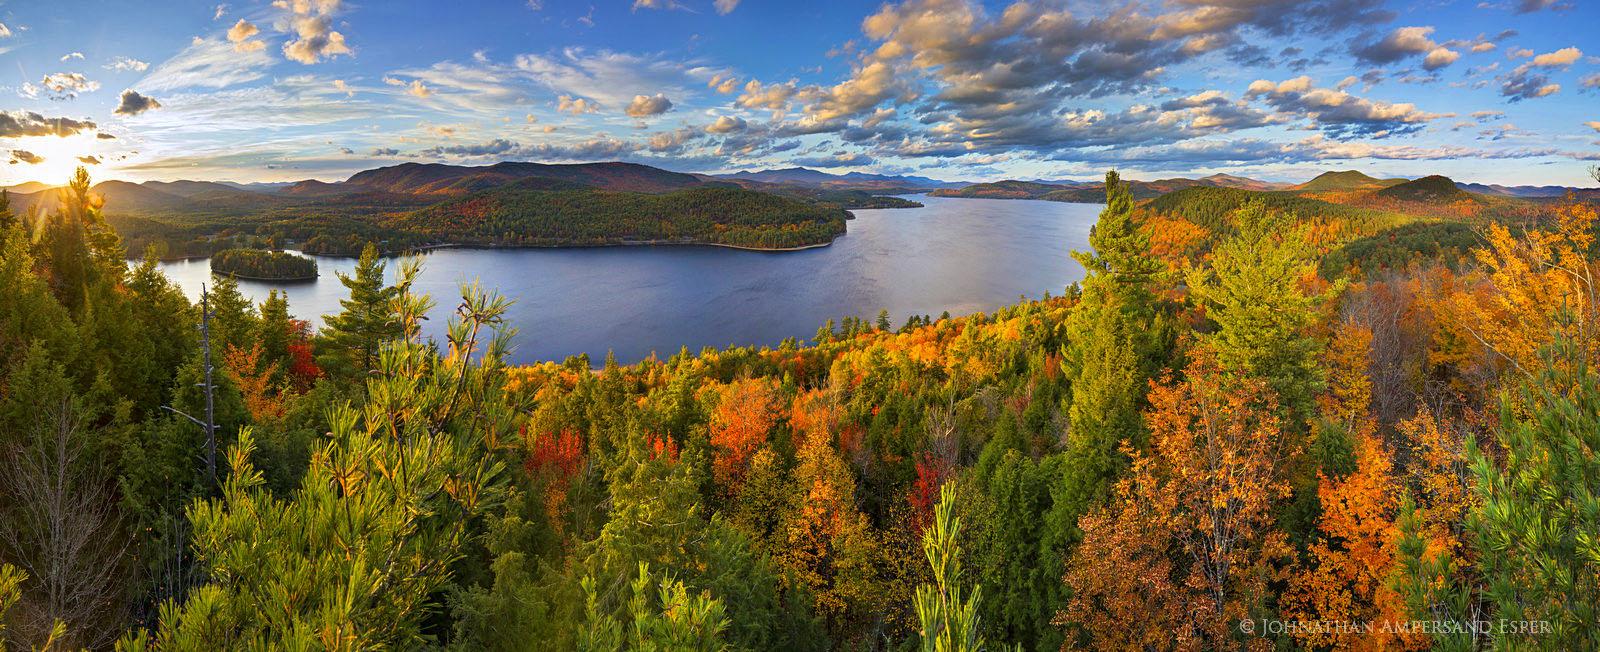 Schroon Lake,treetop,panorama,autumn,2015,southeast shoreline,shoreline,lake,Adirondack,lakes,Adirondack Park,, photo